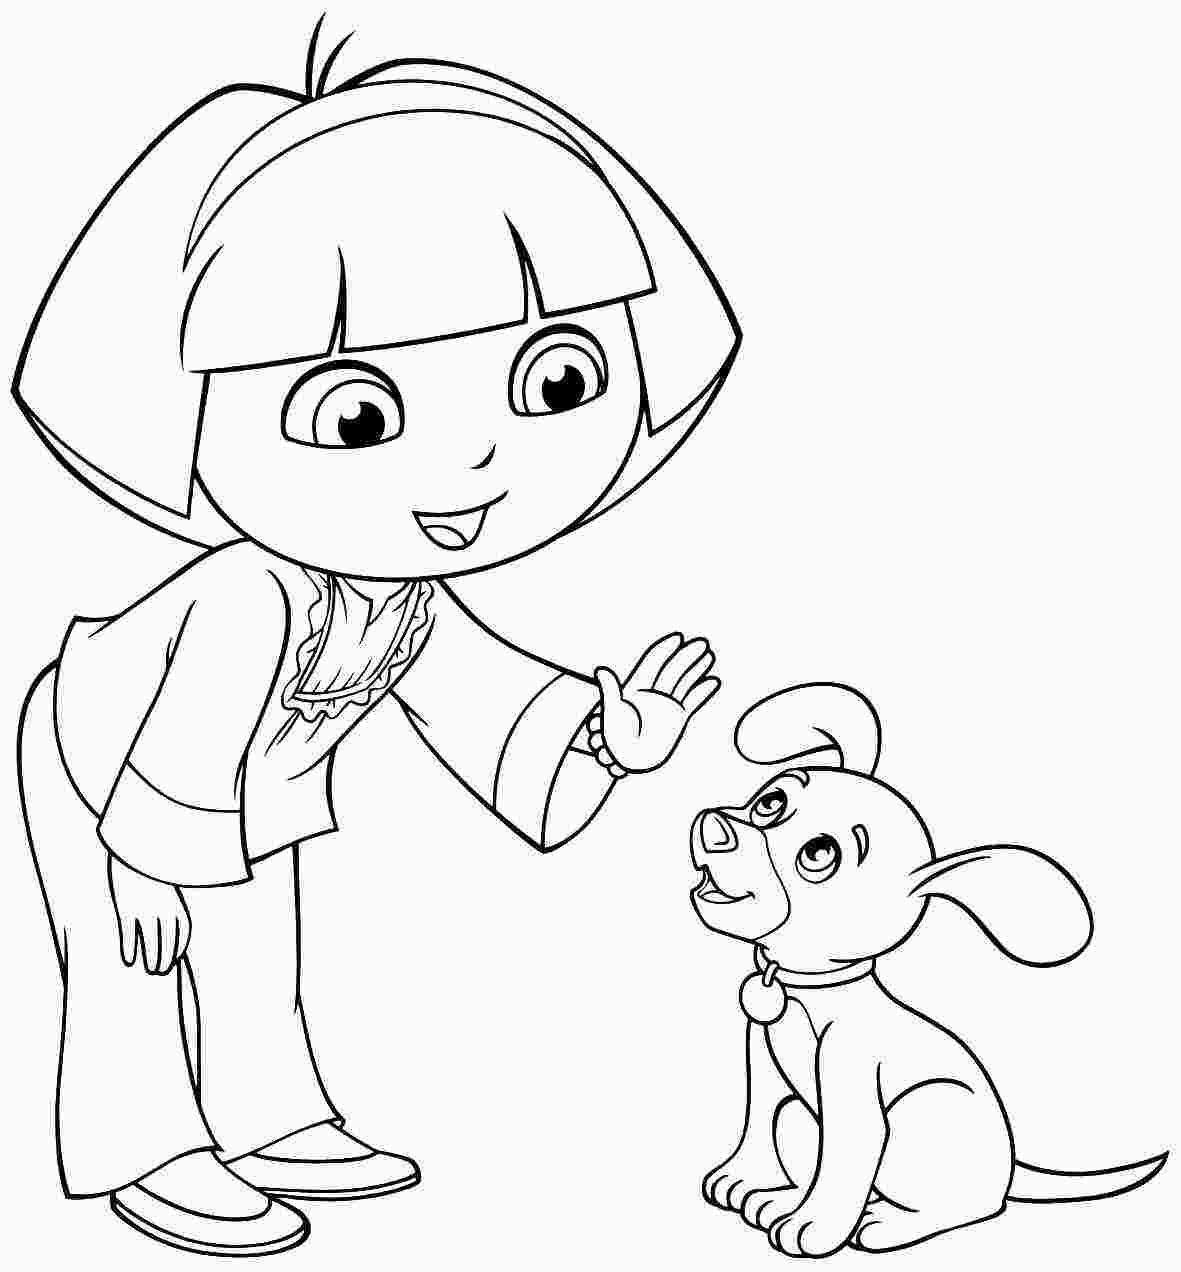 Coloring Dora The Explorer Cartoon Puppy Coloring Pages Dora